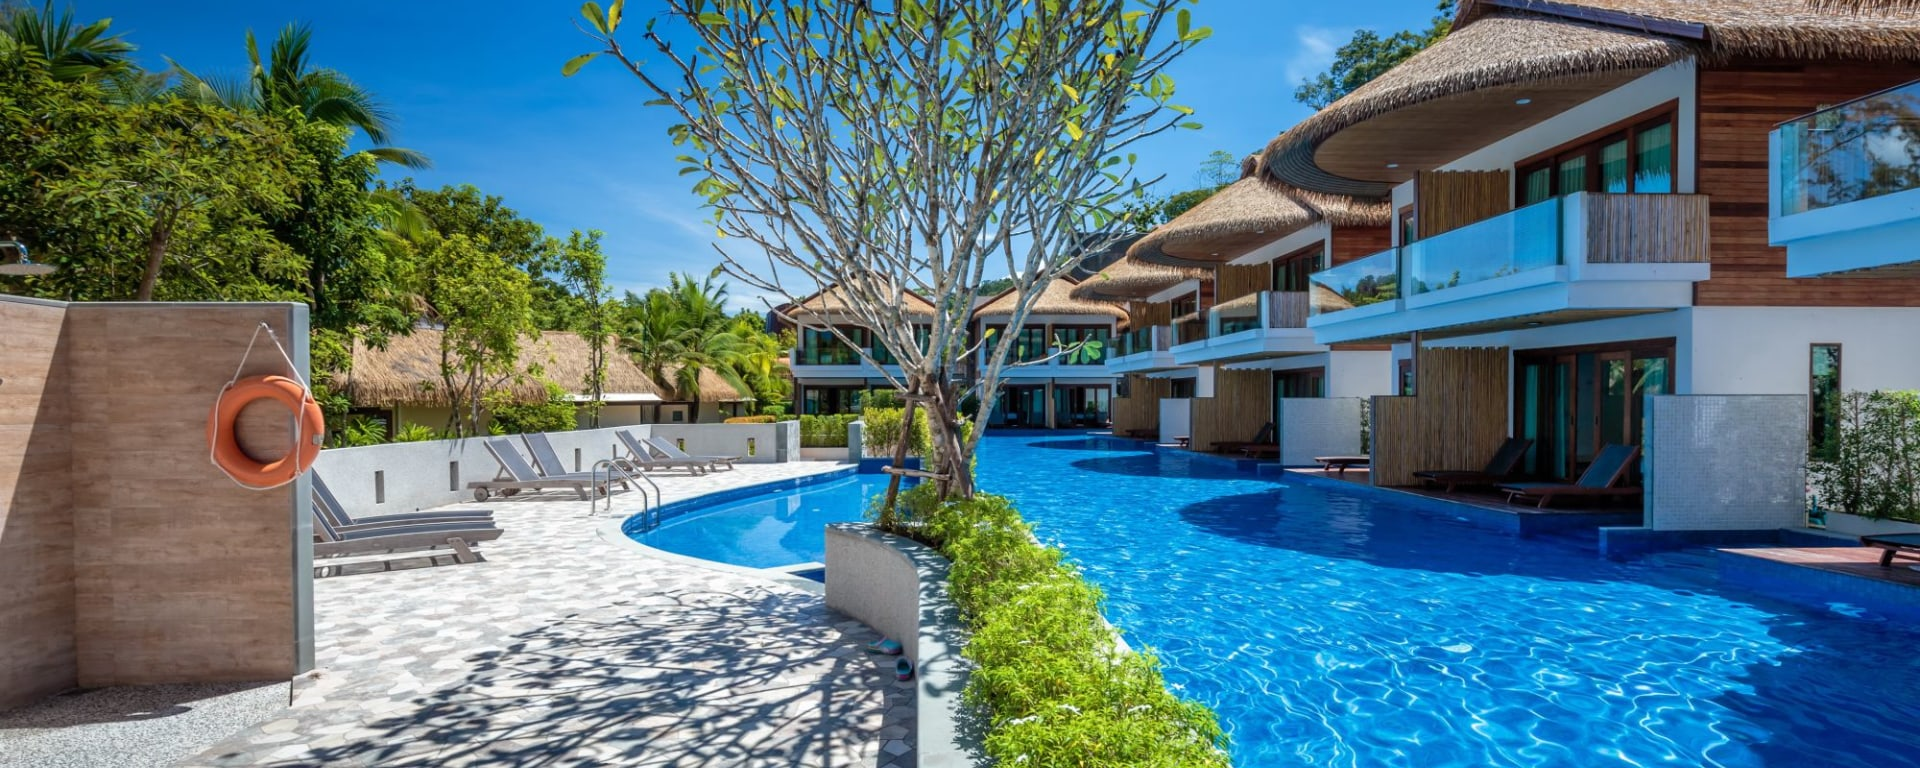 Tup Kaek Sunset Beach Resort à Krabi: Swimming Pool